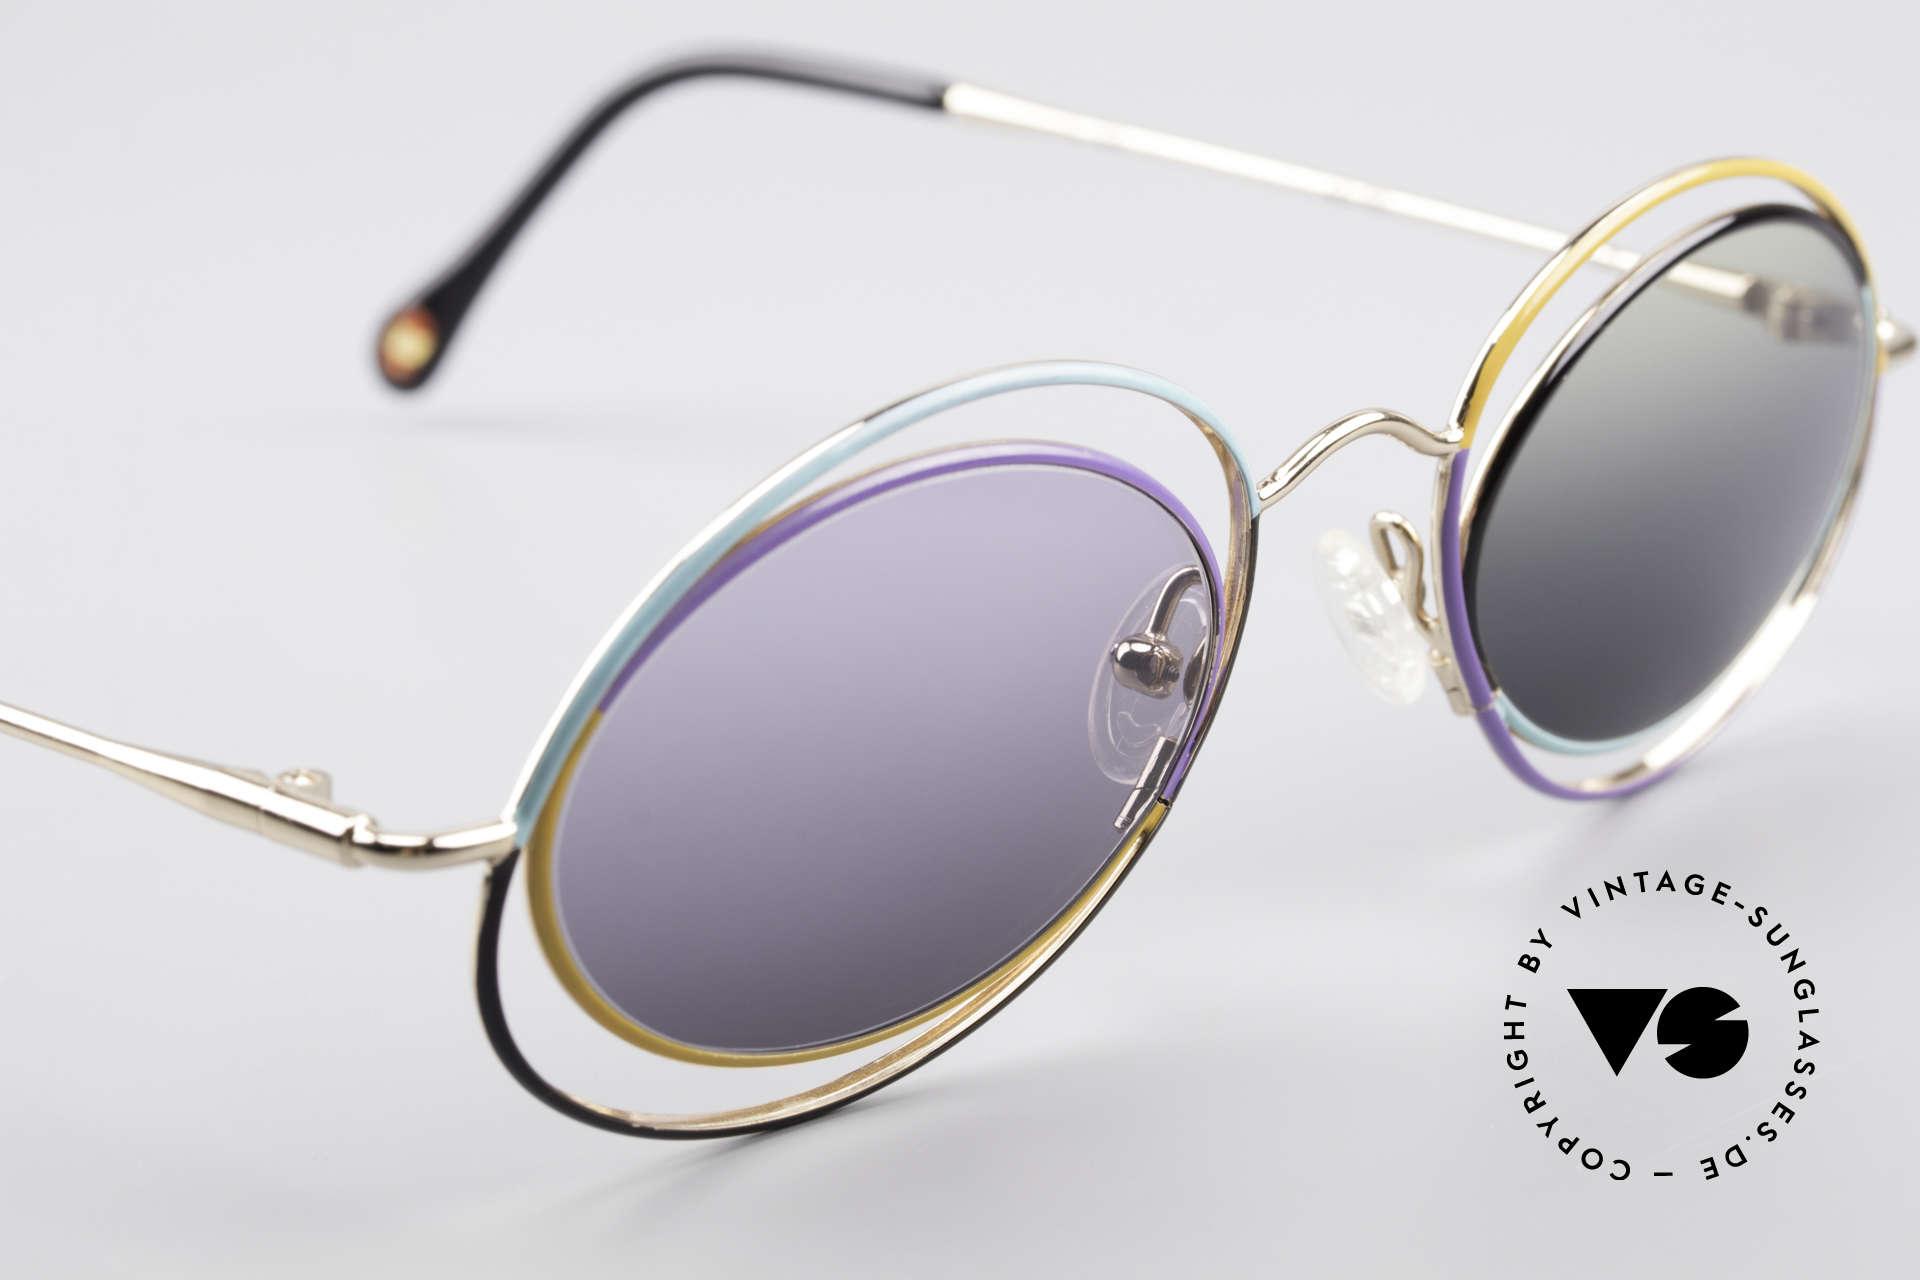 Casanova LC18 Vintage Art Sunglasses 80's, unworn (N.O.S.) single item: really a piece of art!, Made for Women